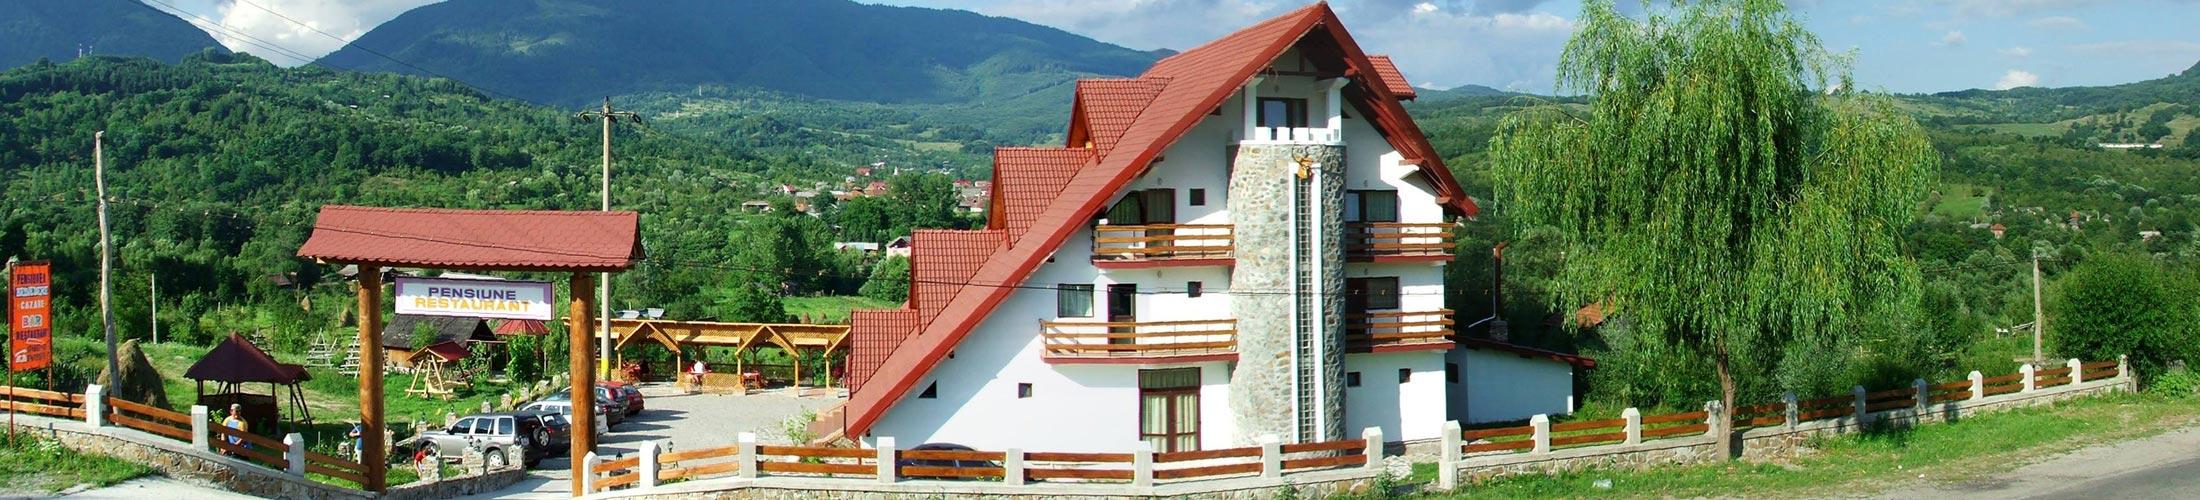 Pensiune Belvedere Transfagarasan